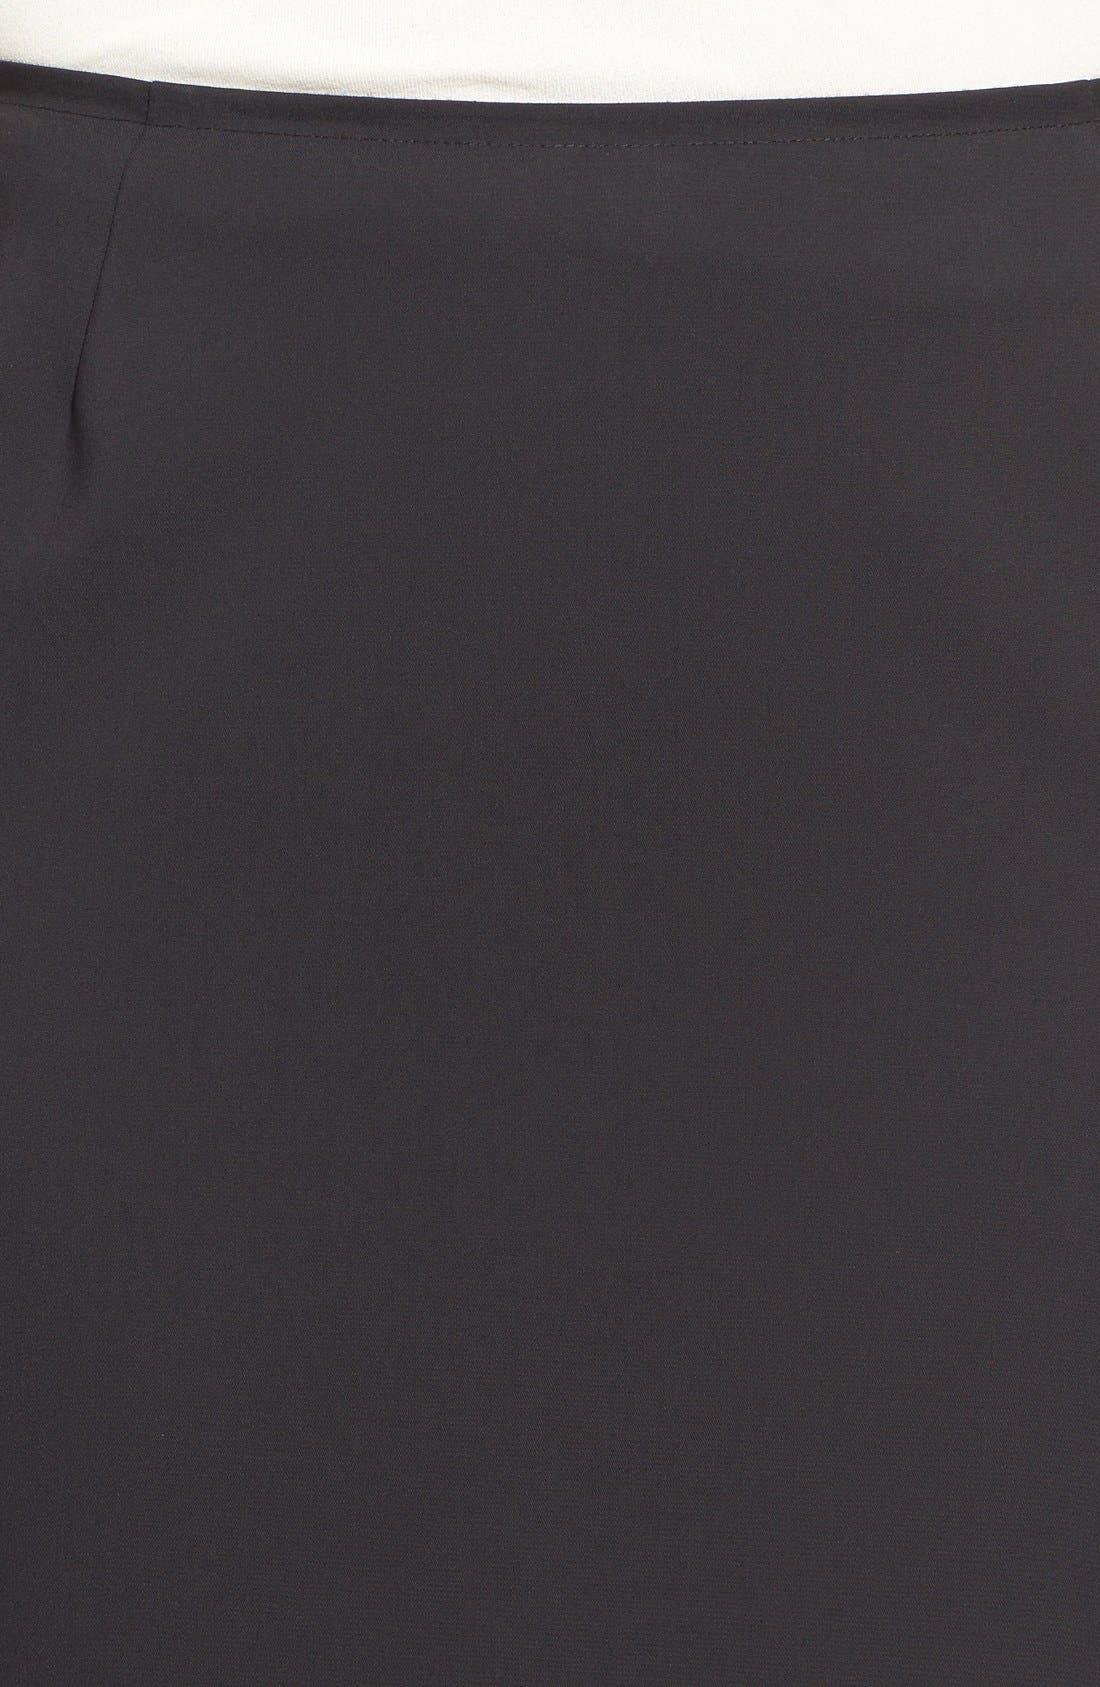 Pencil Skirt,                             Alternate thumbnail 4, color,                             001